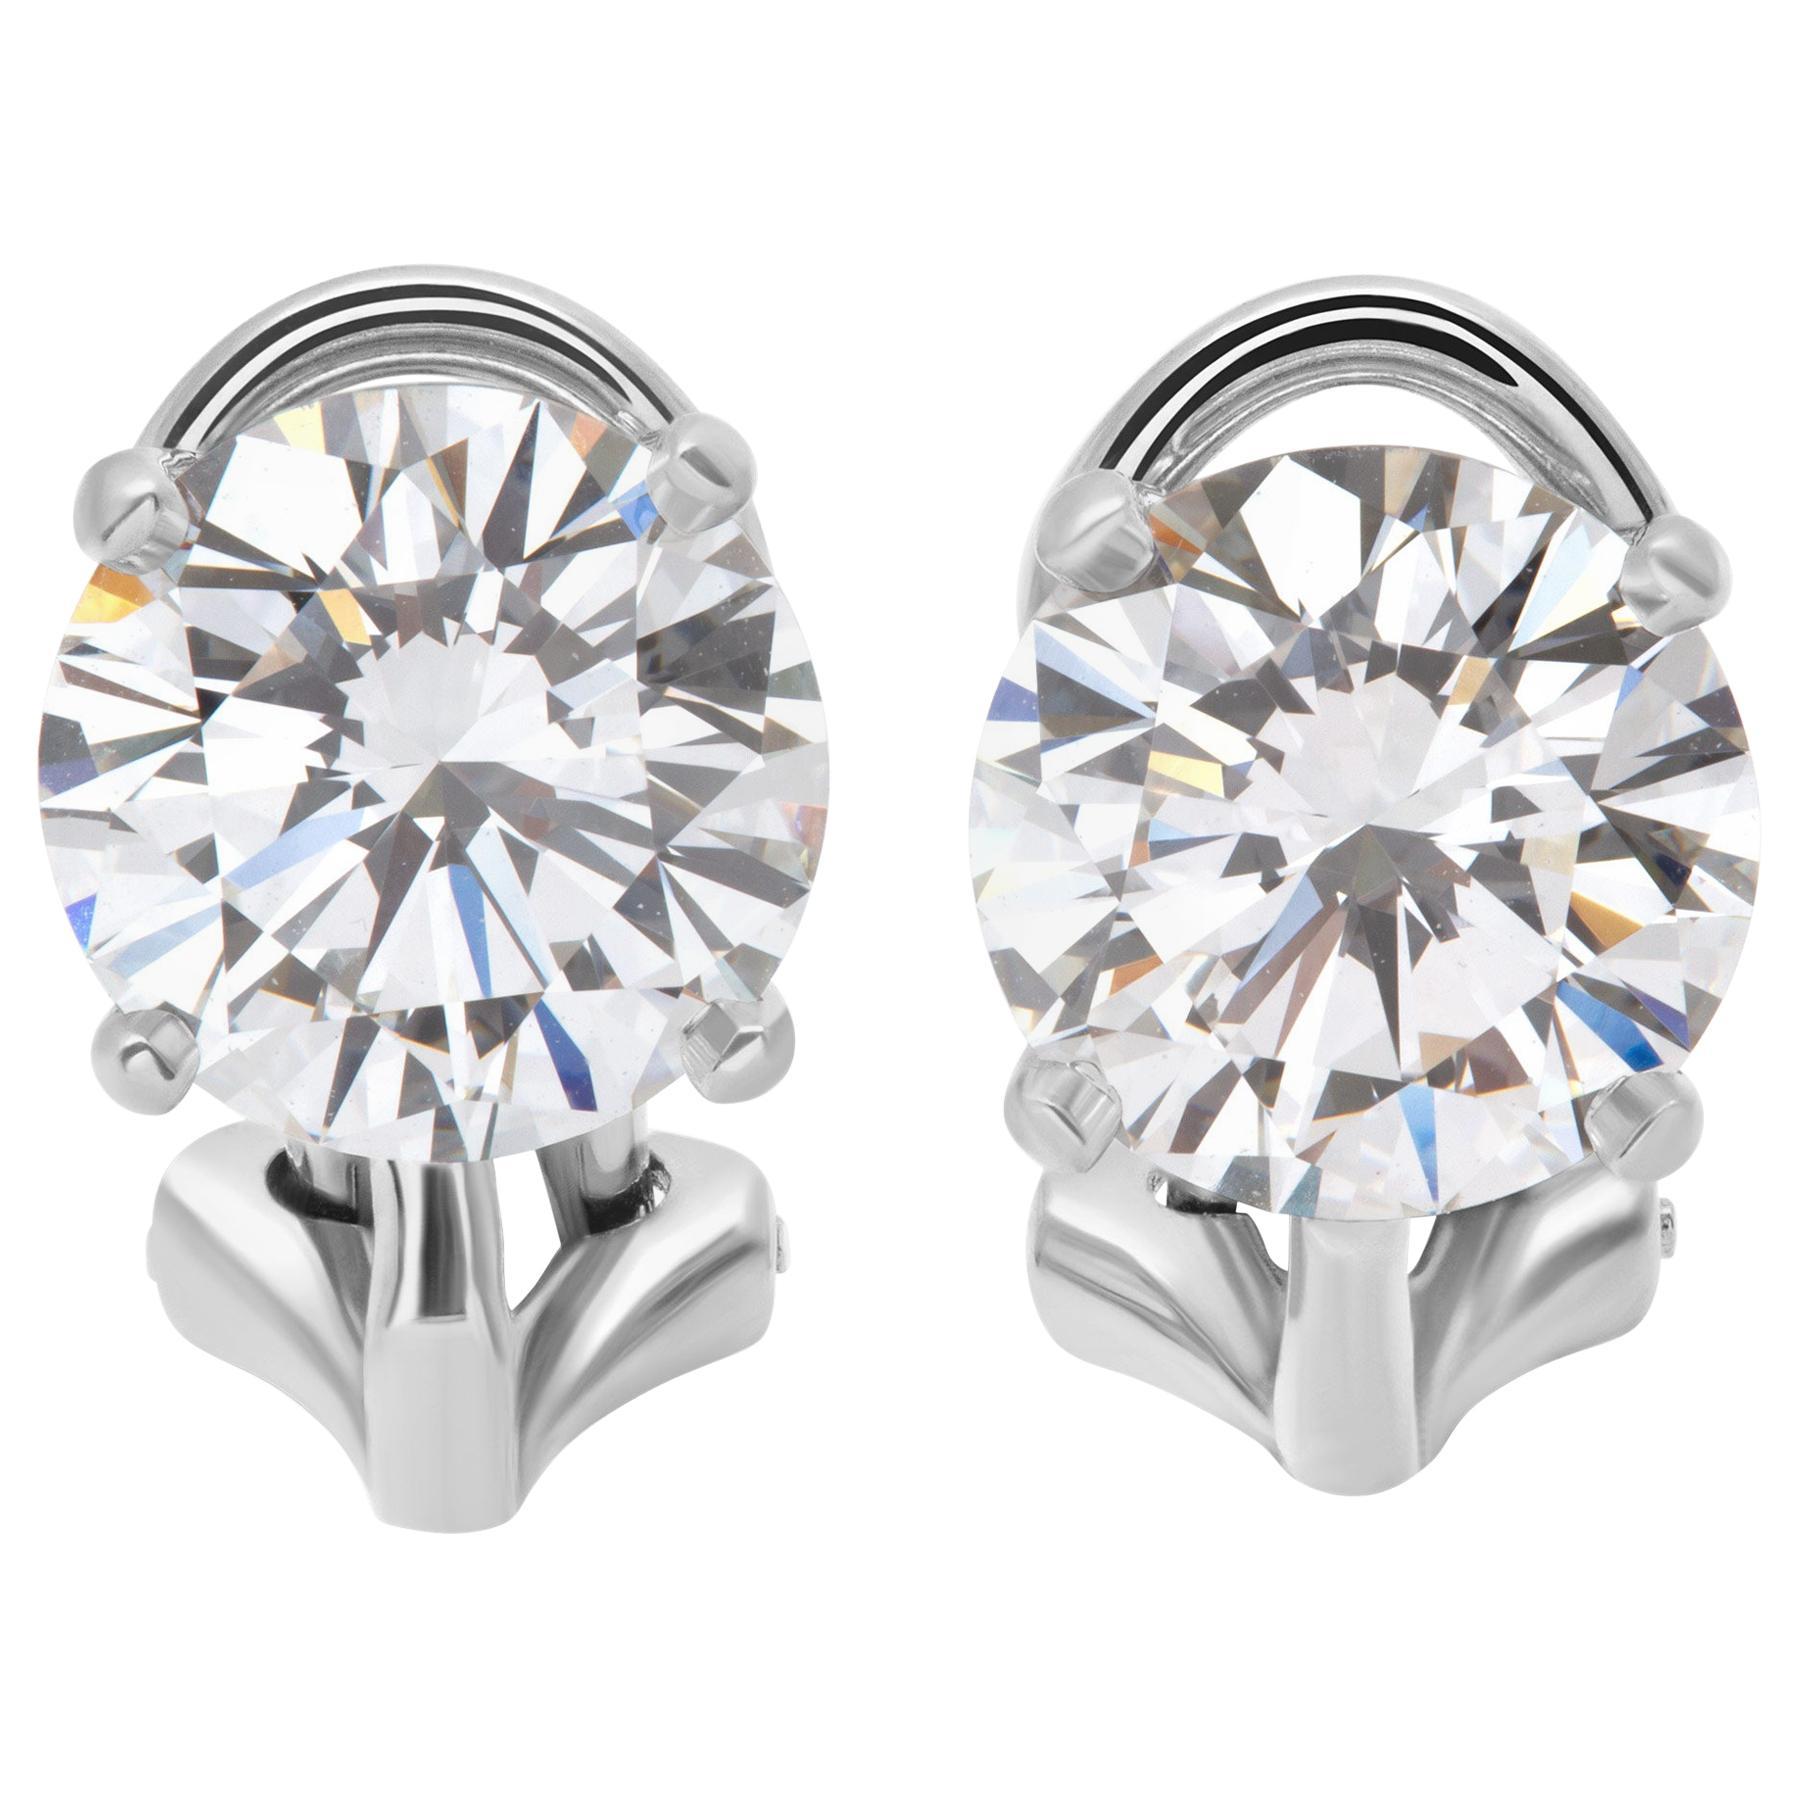 GIA Certified Tiffany & Co. Diamond Stud Earrings in Platinum